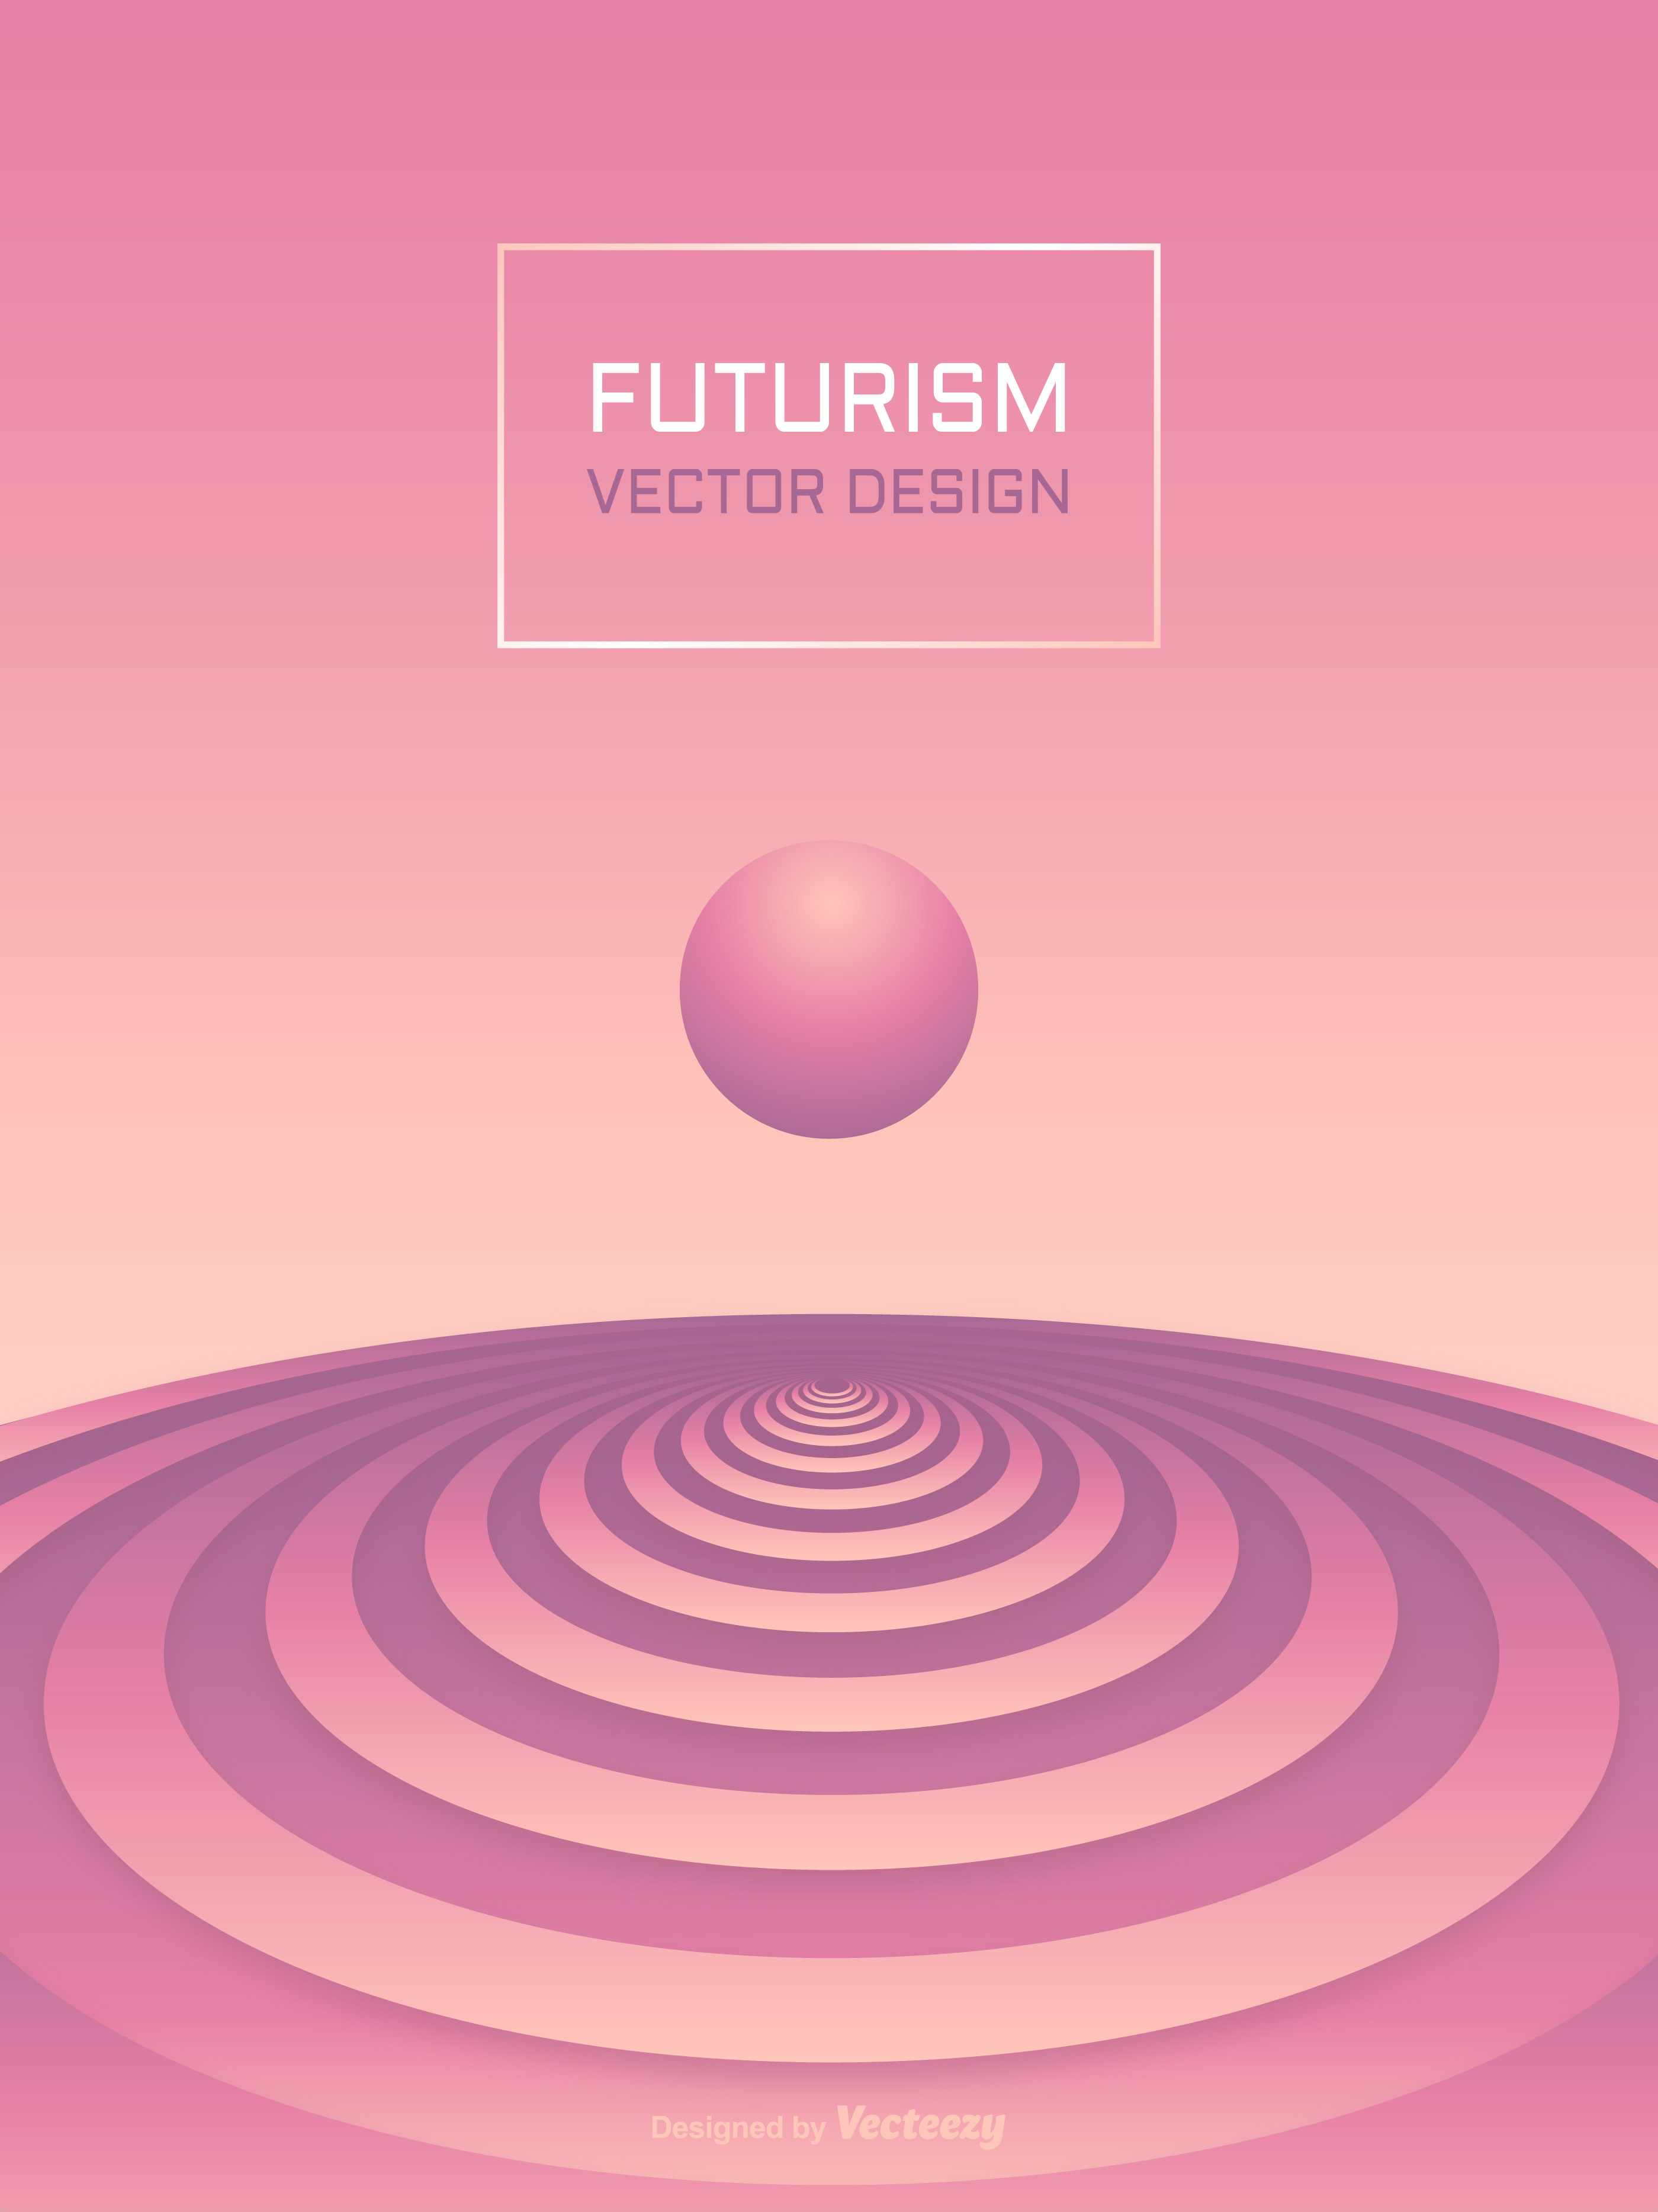 Futurism Abstract D Vector Cover Background Download Free Vectors Clipart Graphics Vector Art